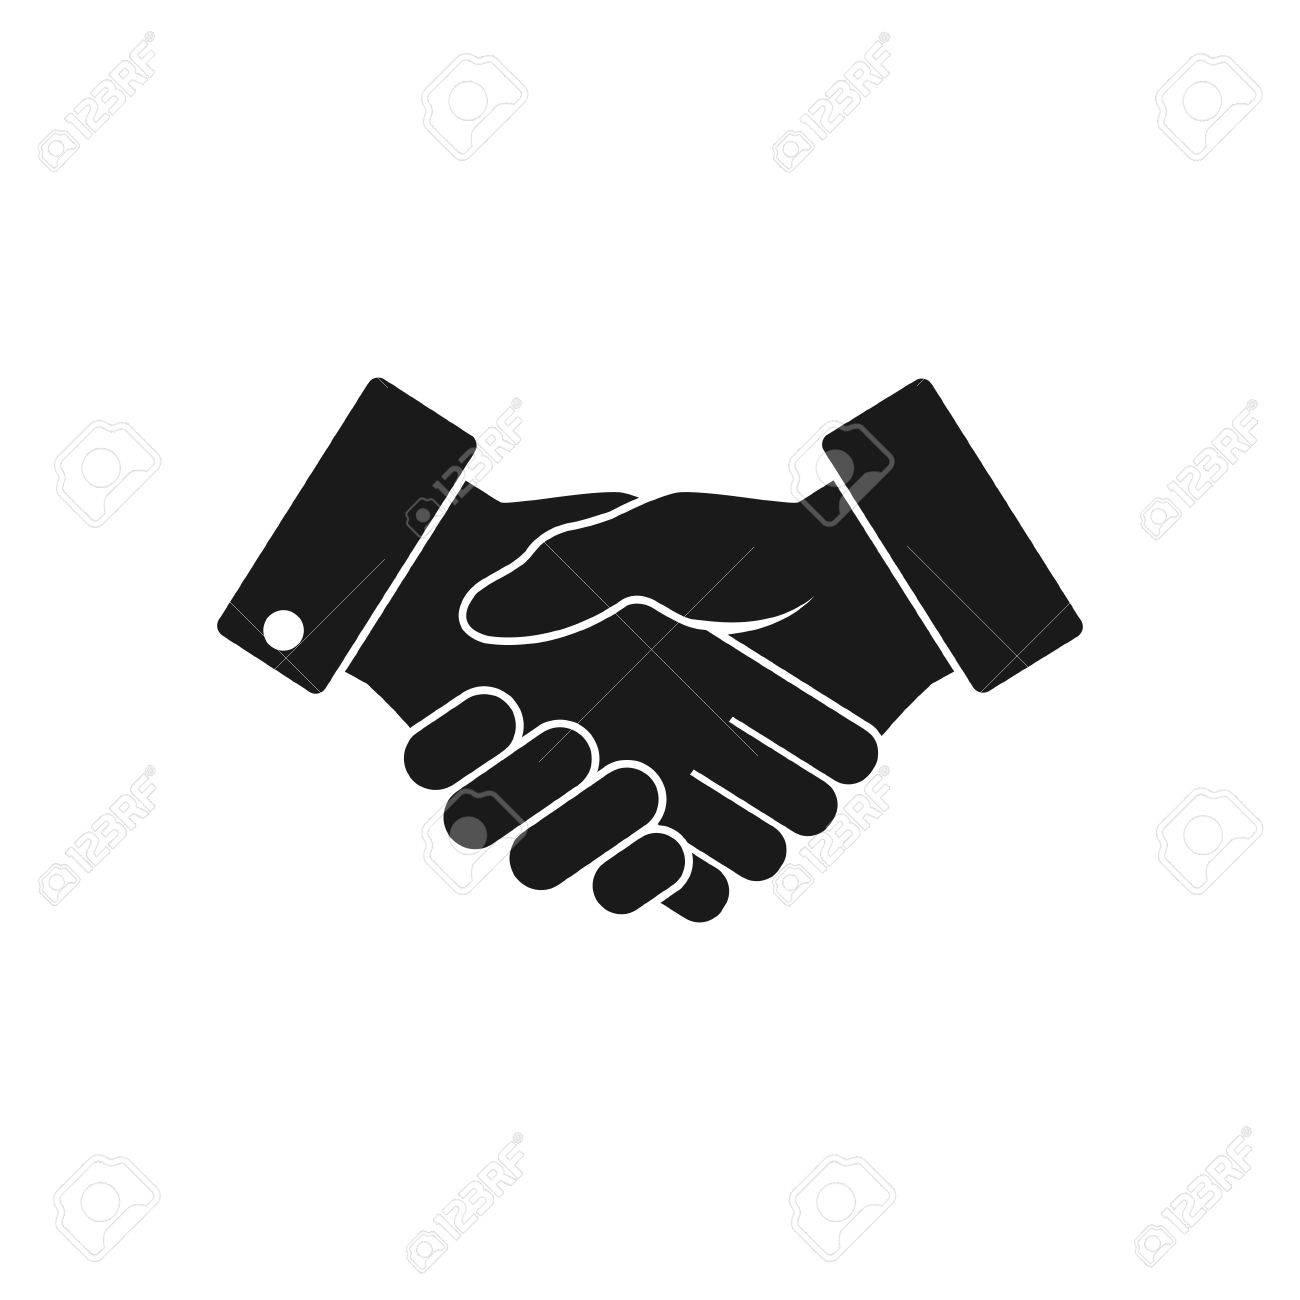 handshake business icon contract agreement flat web icon vector